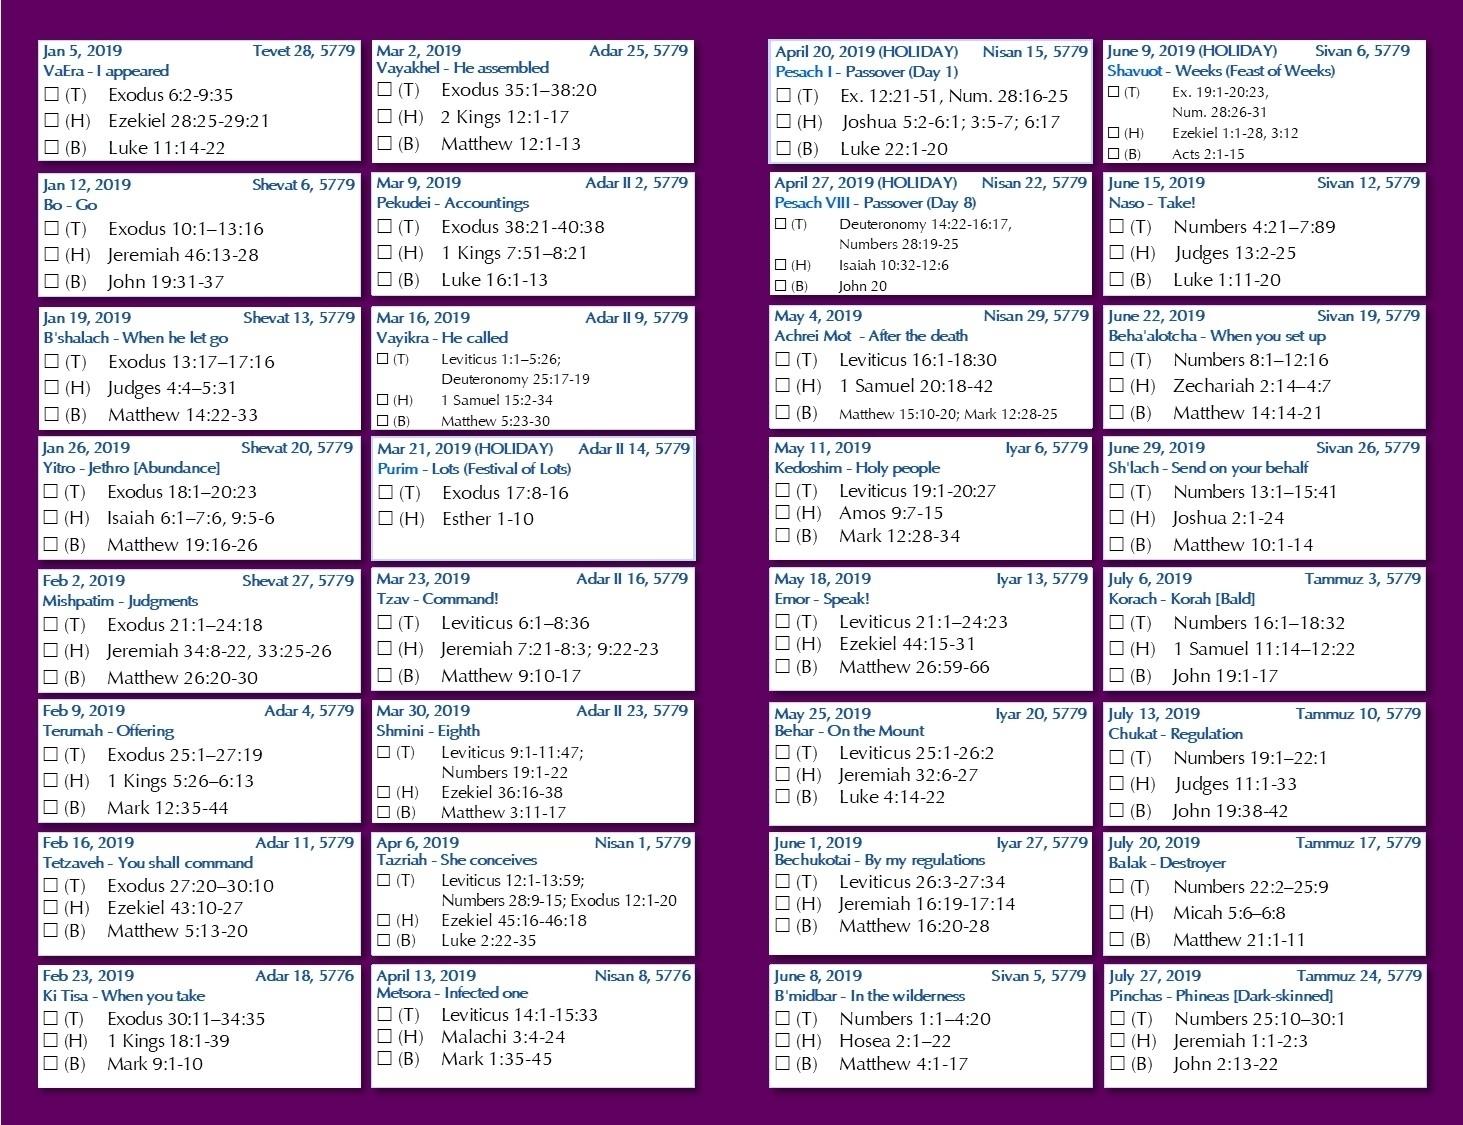 Weekly Torah Parsha Calendar For 2019/2020 - Calendar with Weekly Torah Reading Portions Calendar